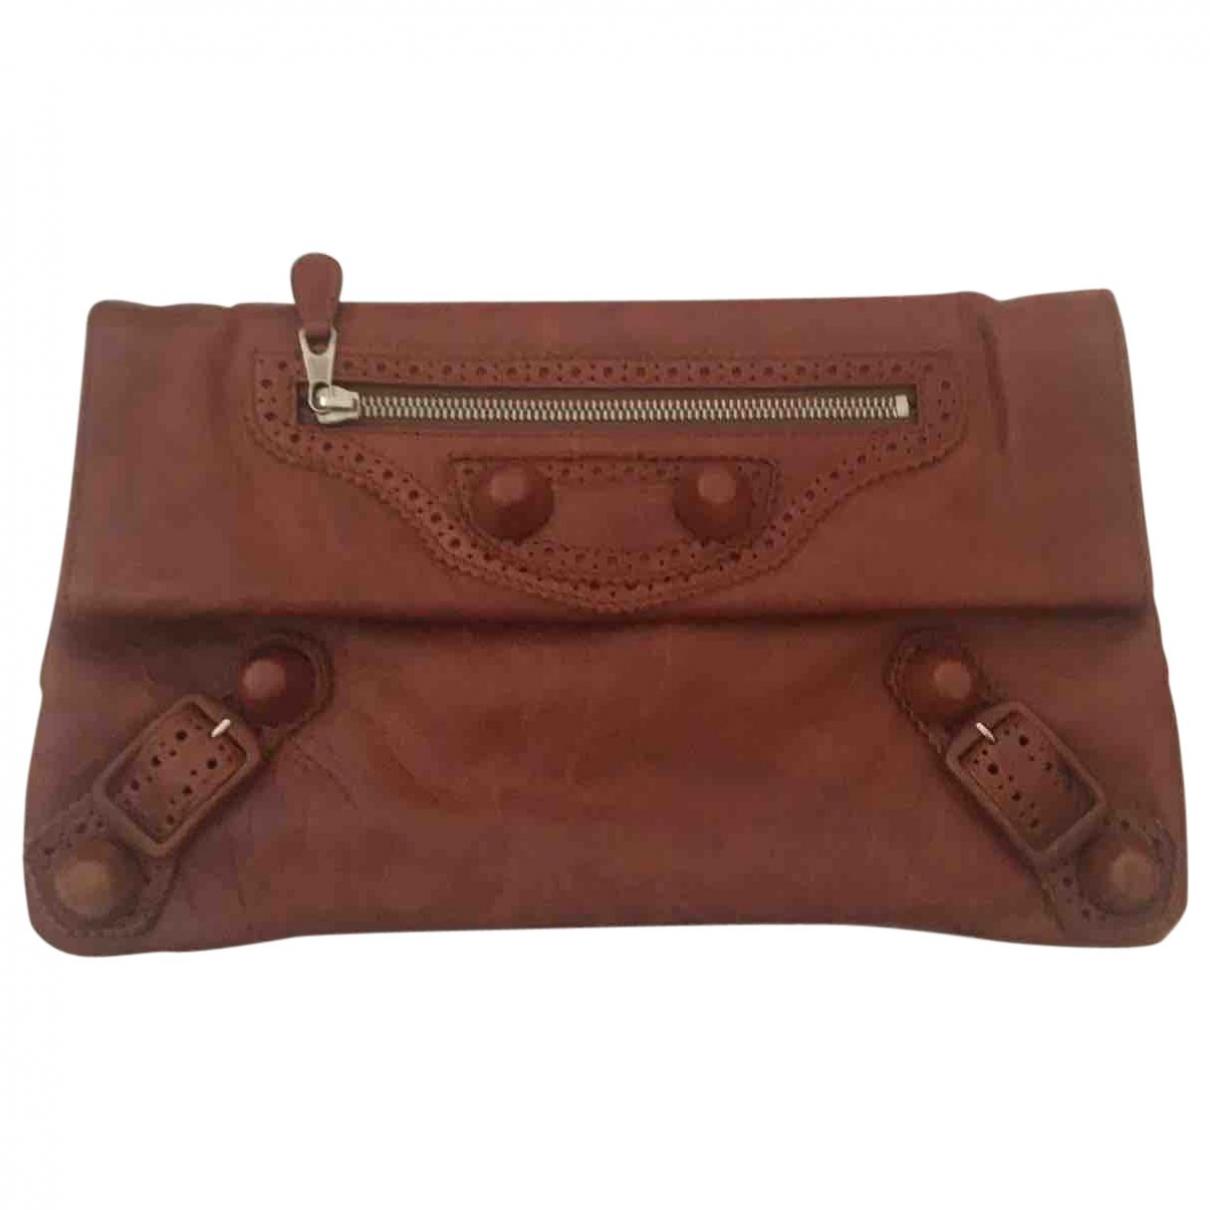 Balenciaga Envelop Clutch in  Braun Leder